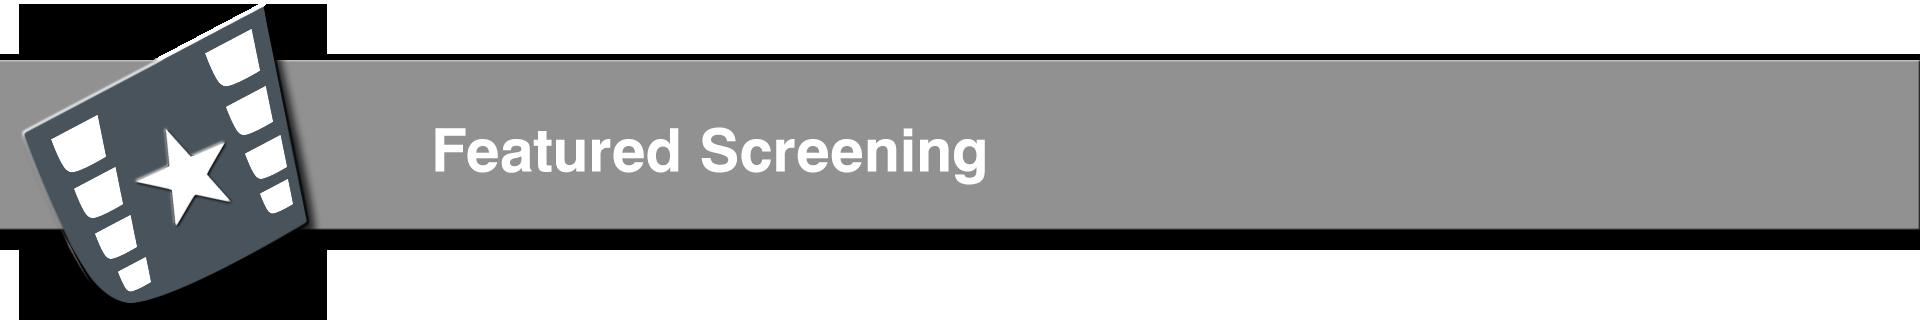 VWF Screening Banner - MTL - Featured Screening.png